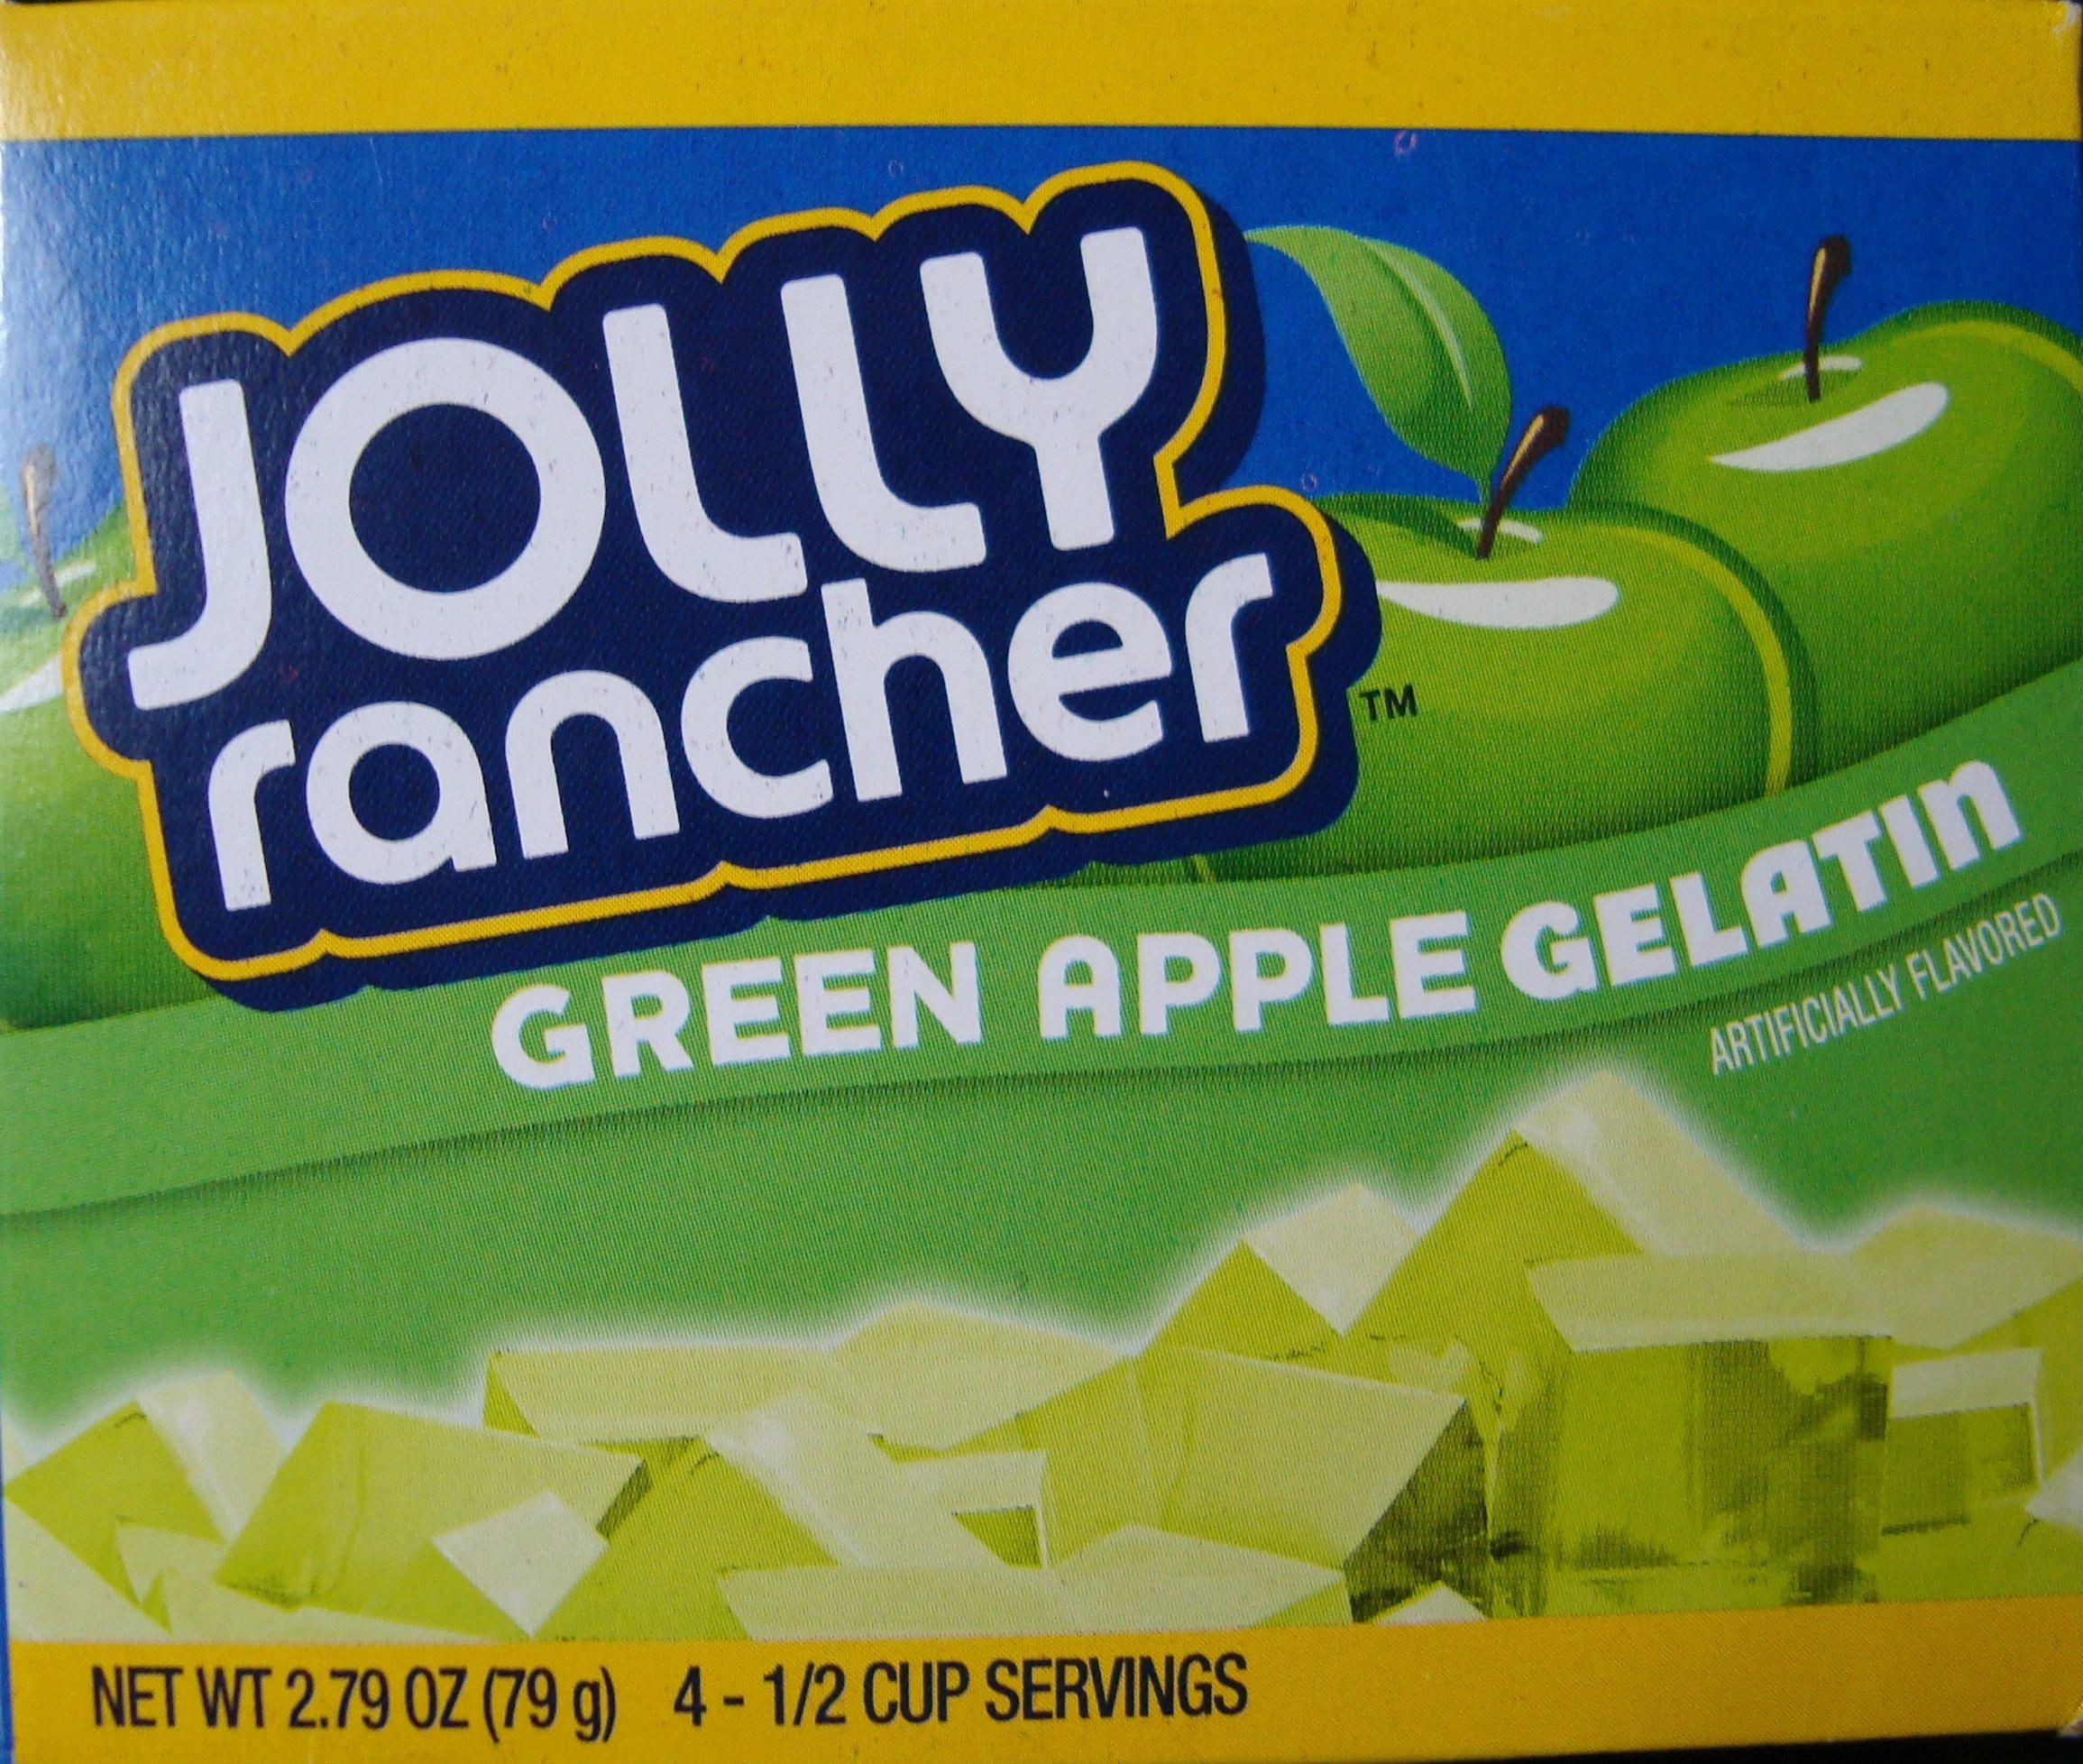 Jolly Rancher Gelatin Green Apple Flavor 2.79 oz Box